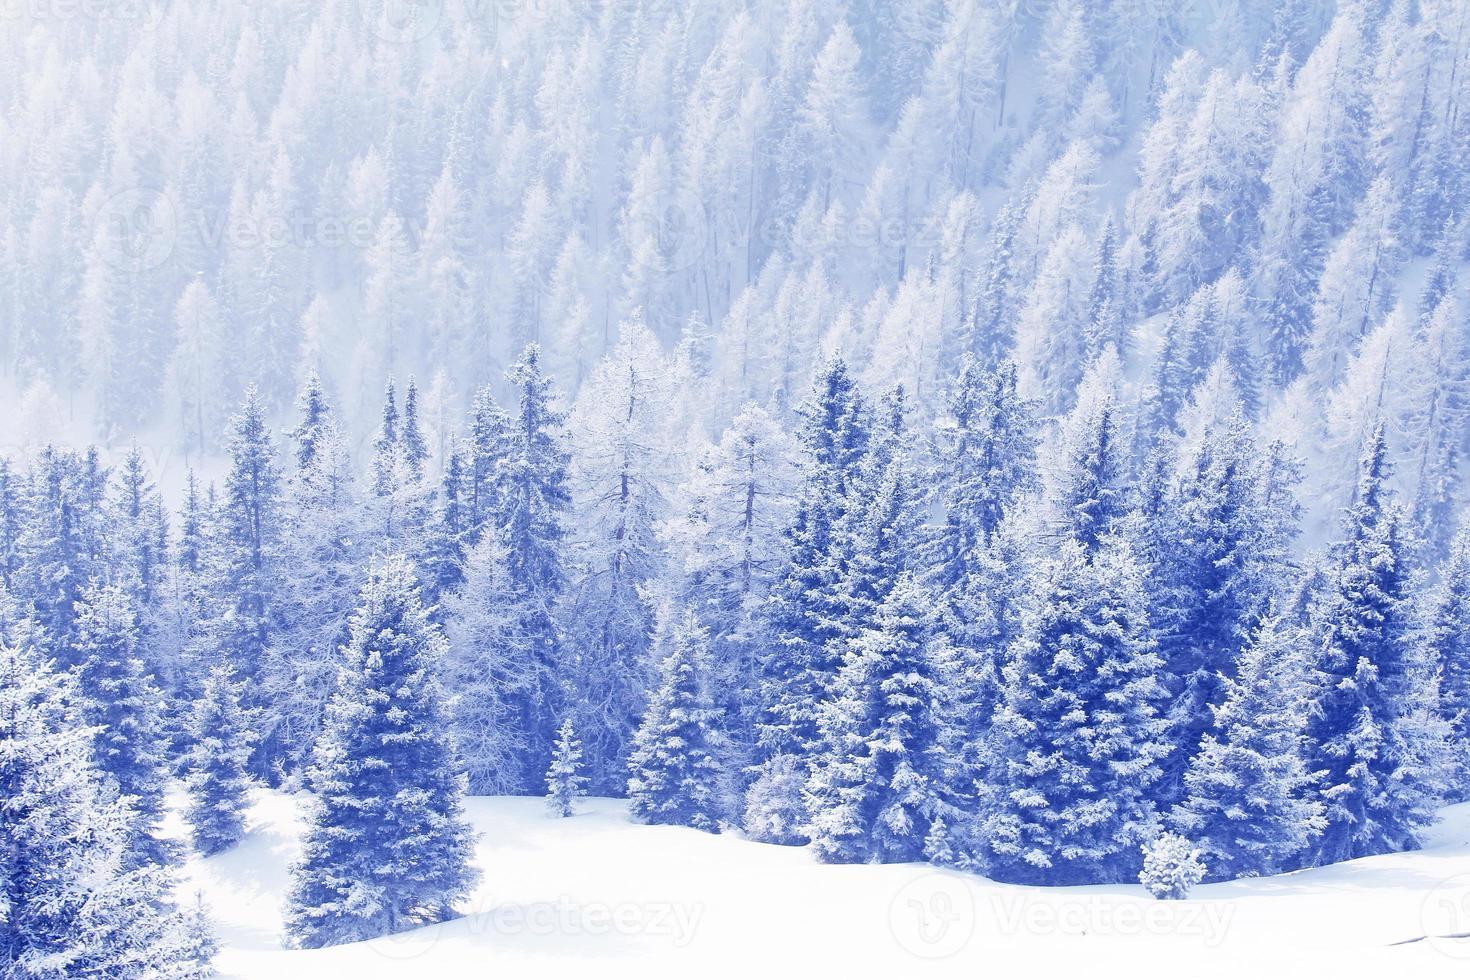 Winterwald in den Bergen foto